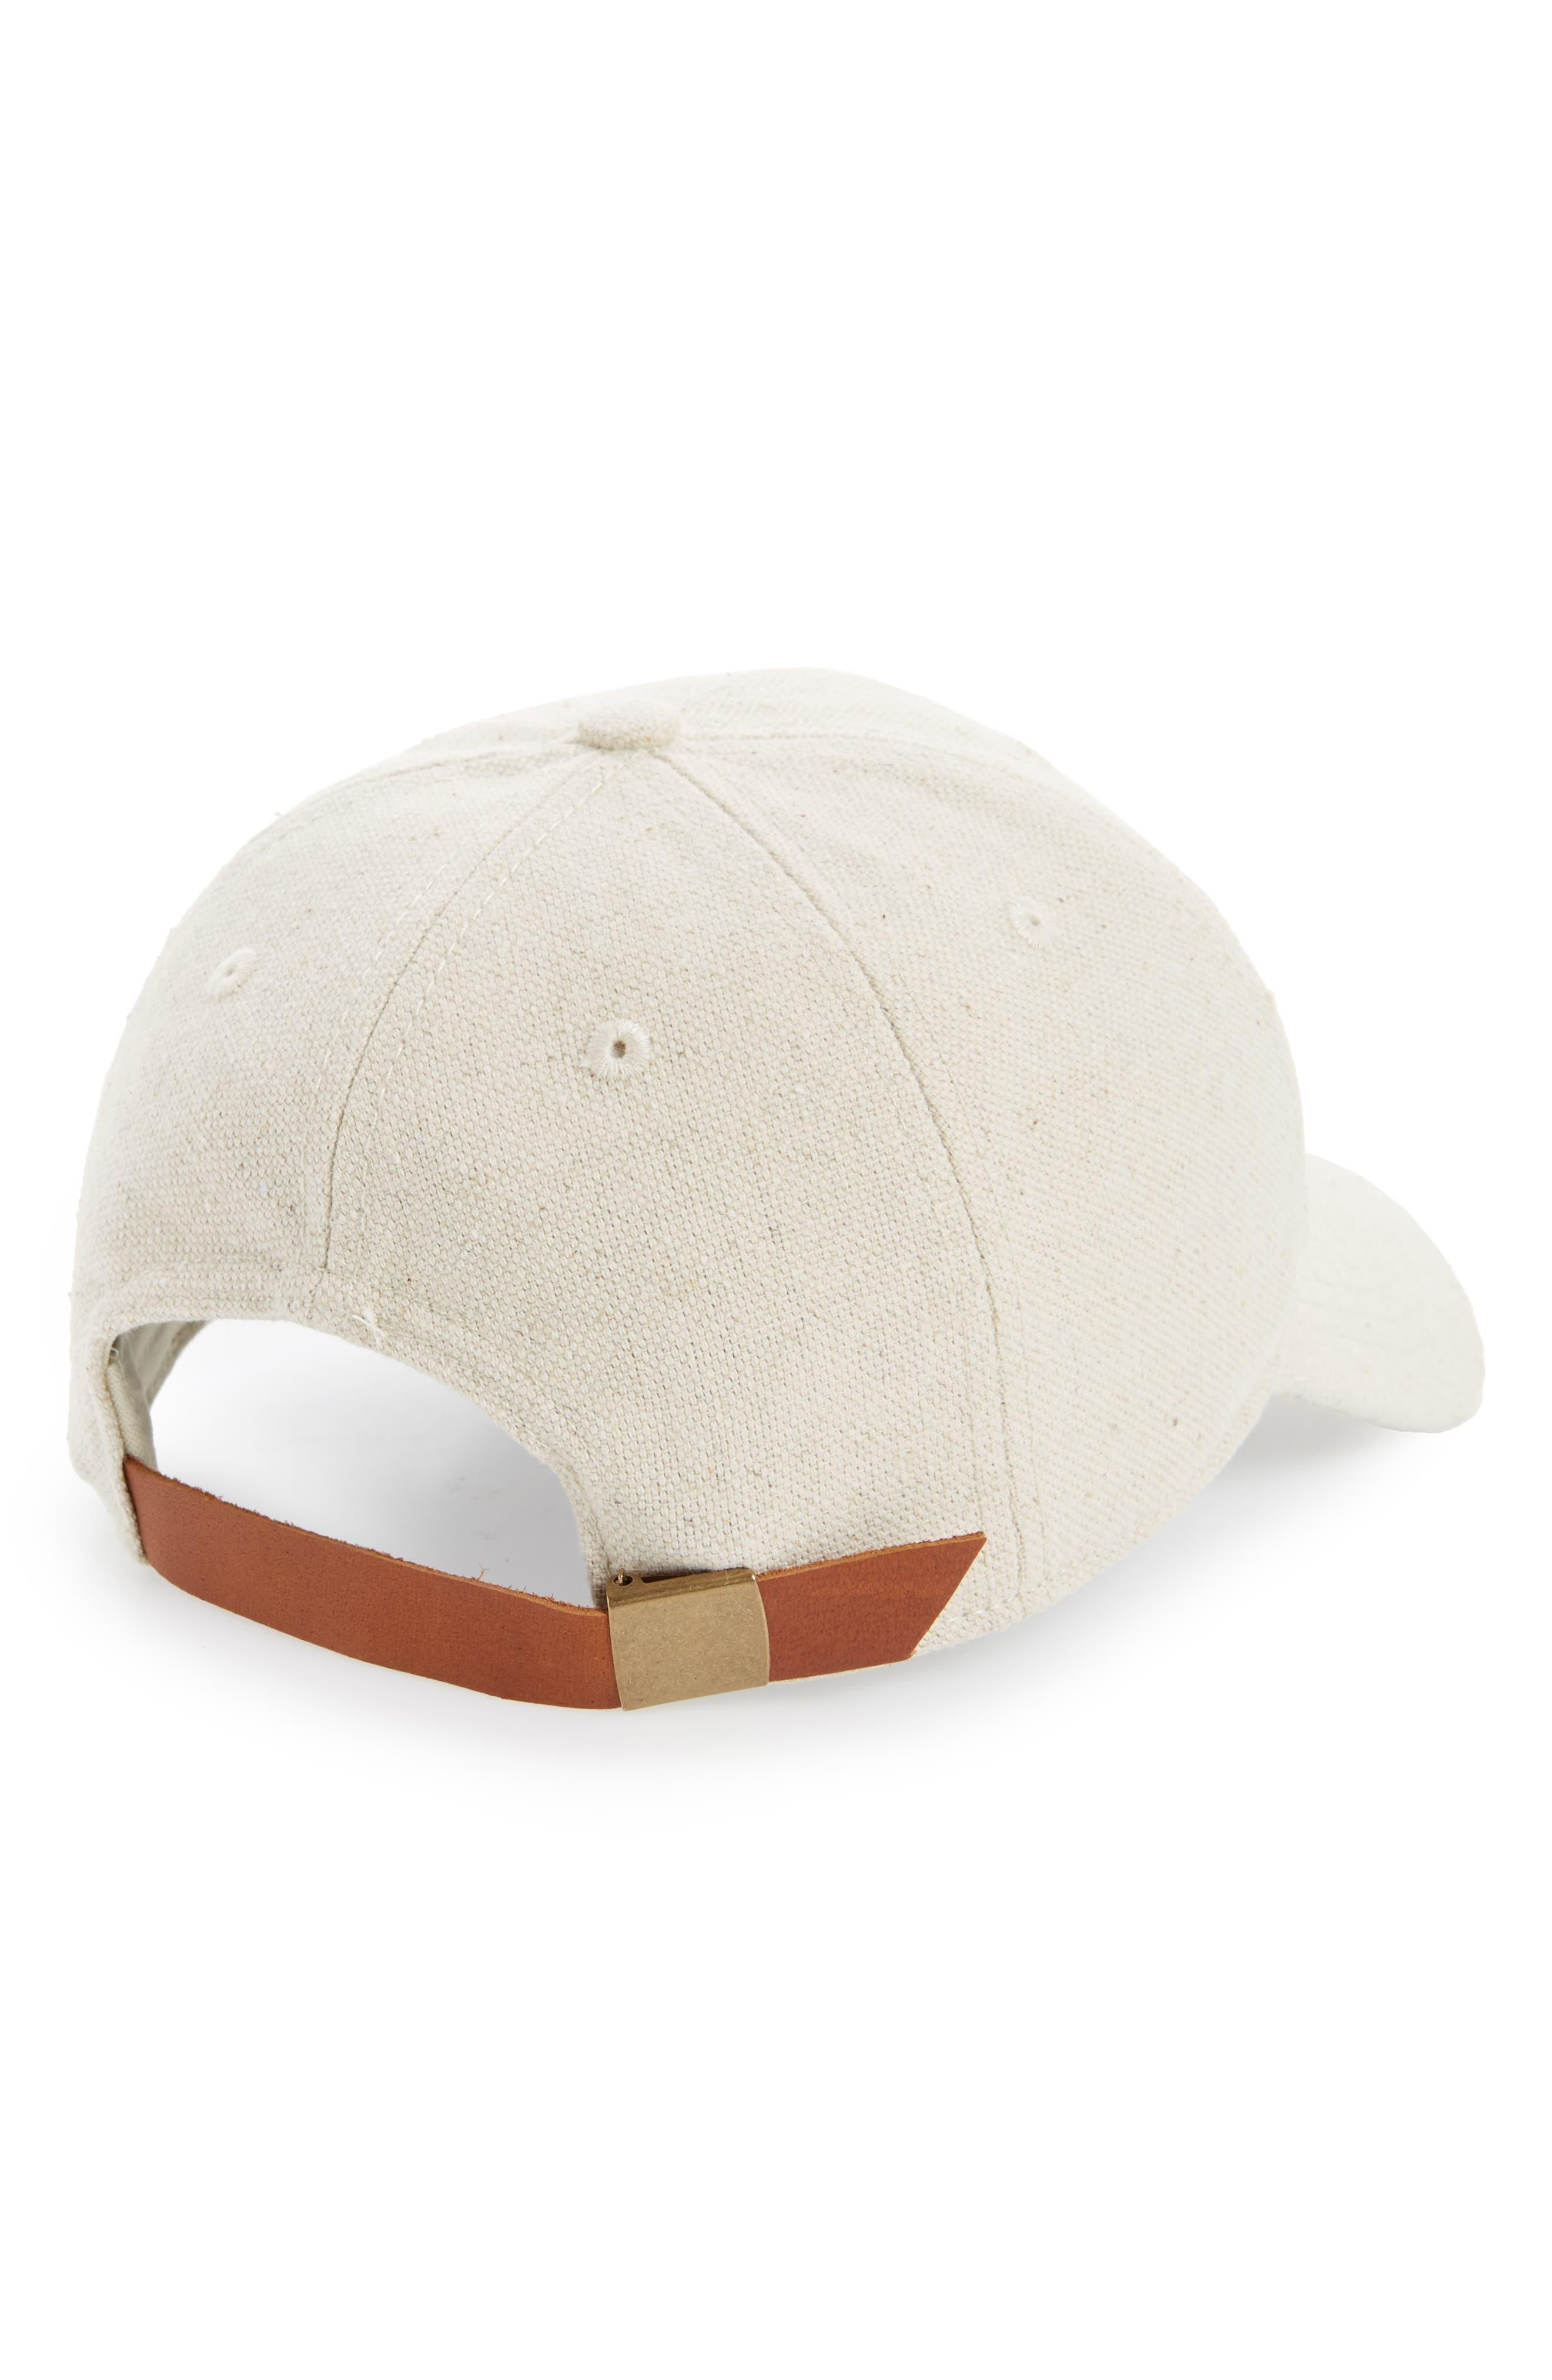 Cotton & Linen Baseball Cap,                             Alternate thumbnail 2, color,